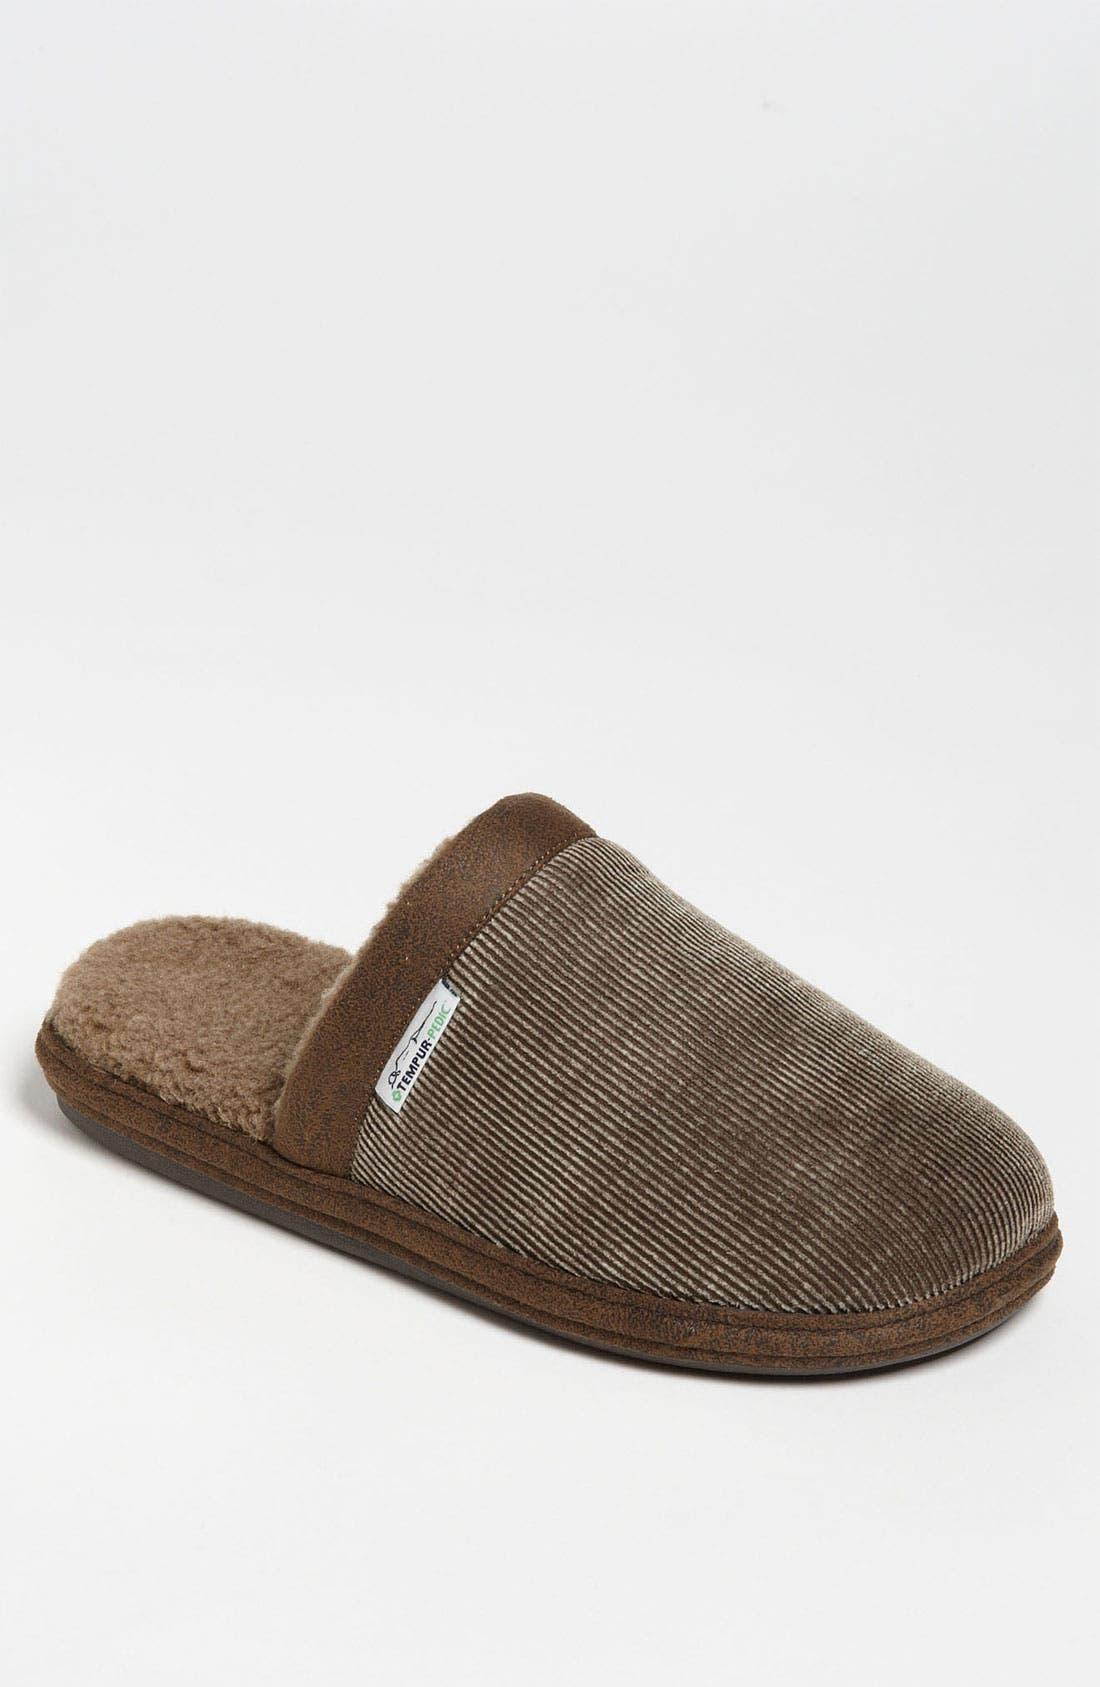 Main Image - Tempur-Pedic® 'Corduroy Scuff' Slipper